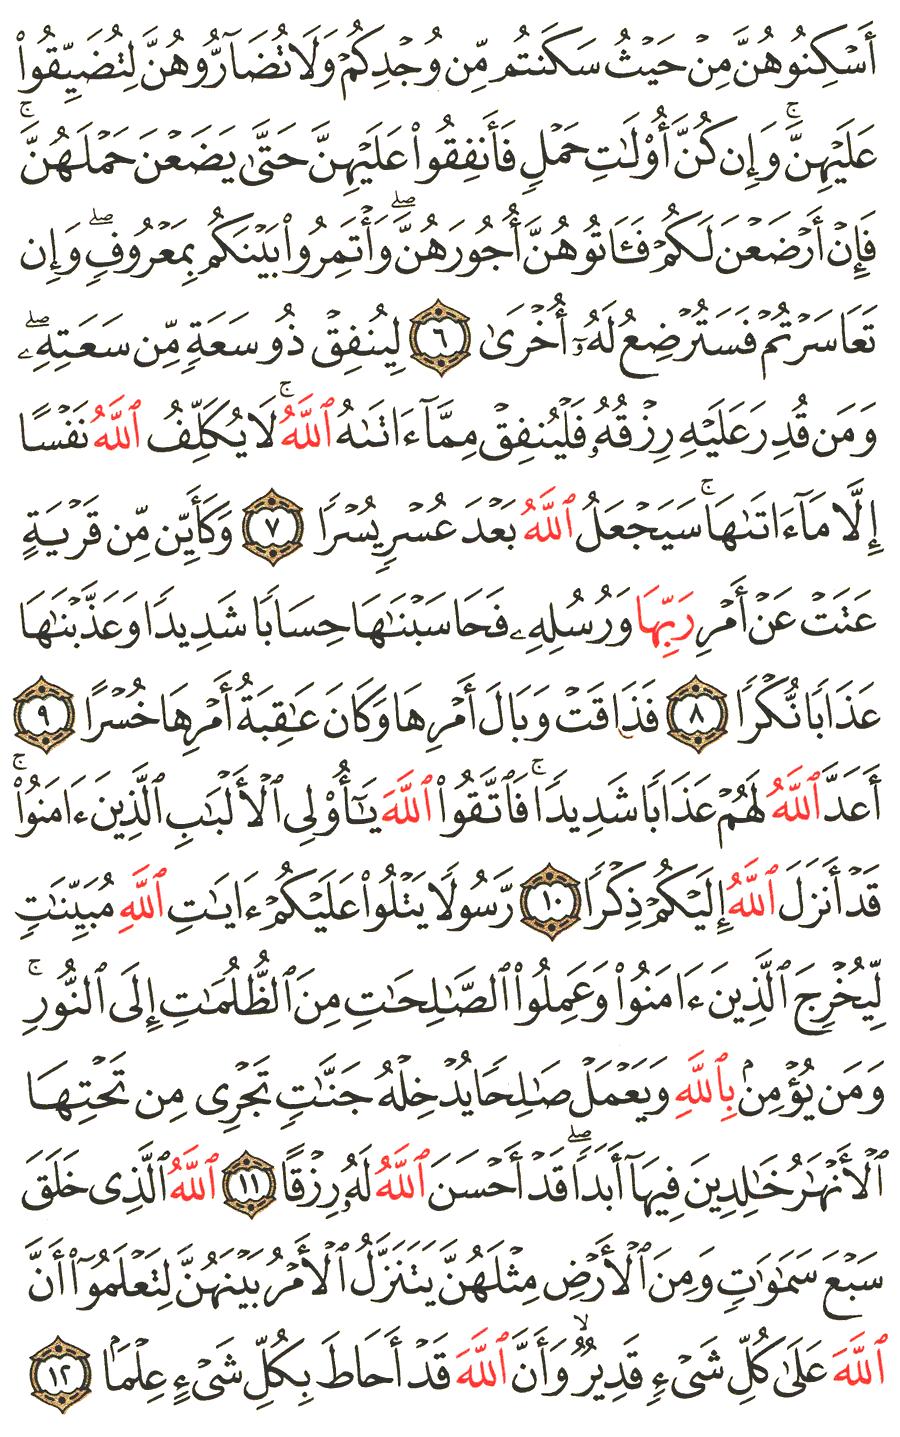 Surat At Talaq : surat, talaq, Surah, At-Talaq, English, Translation, Meaning